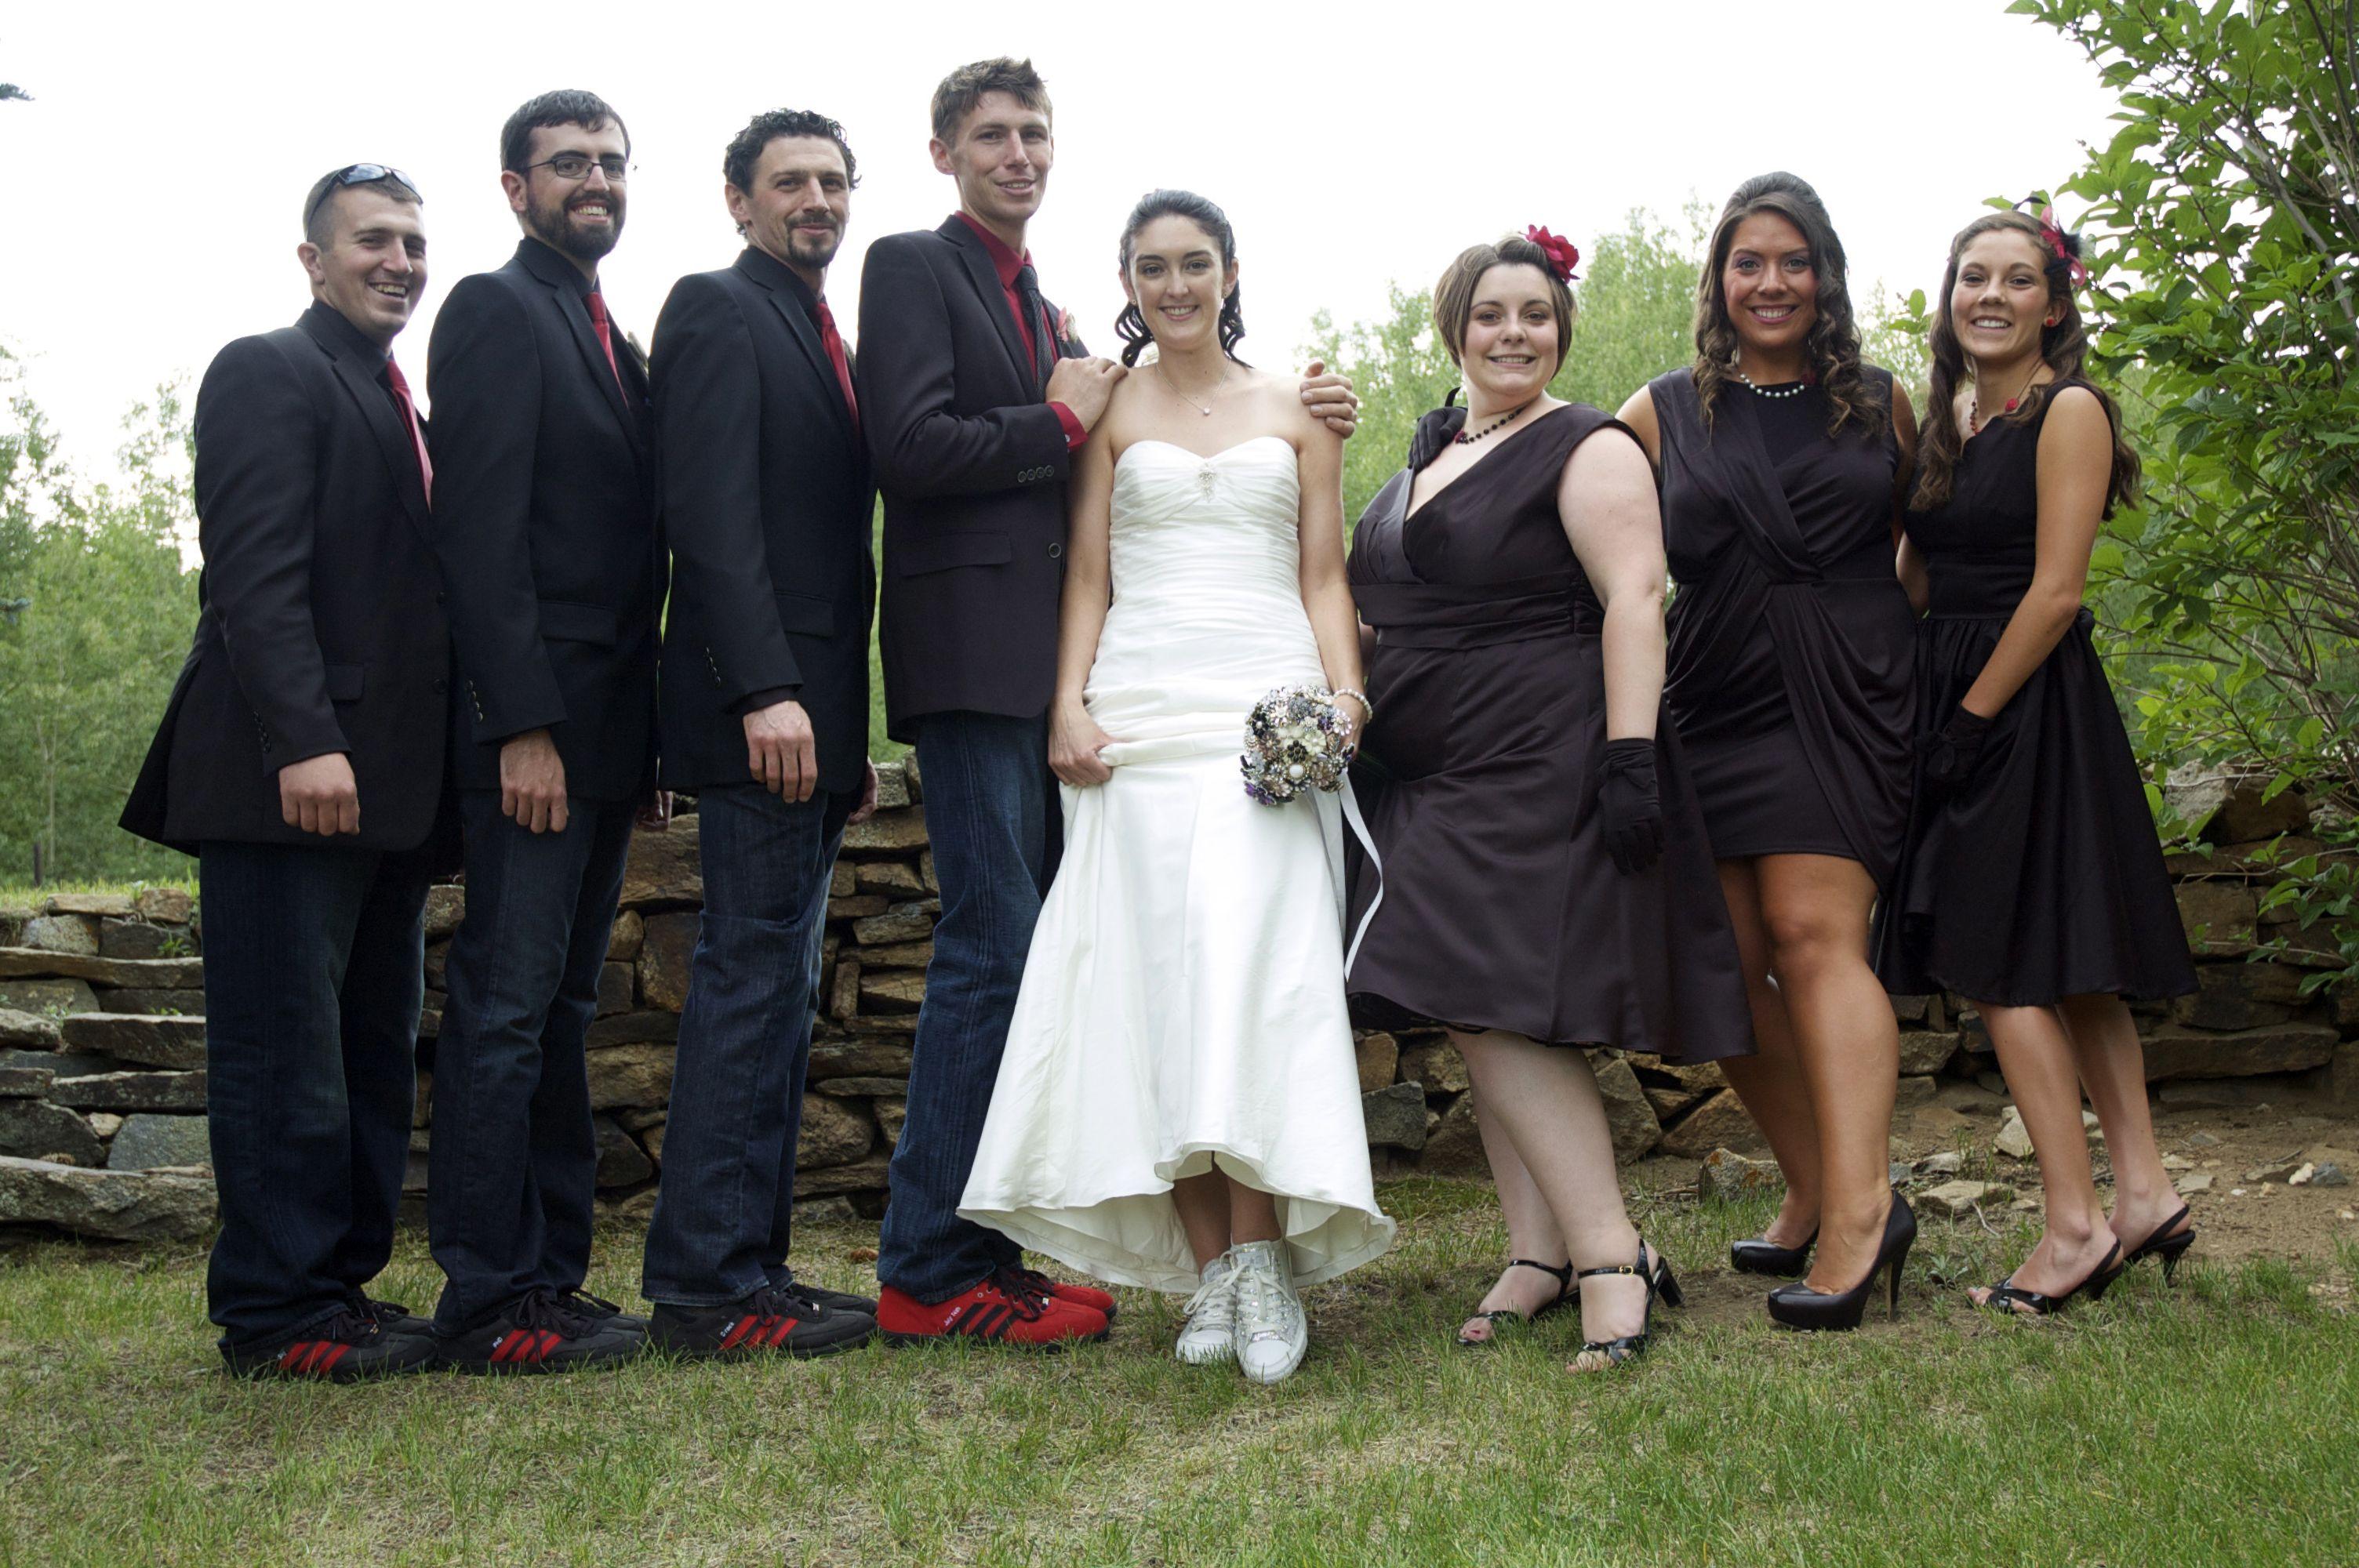 scarpe per i testimoni (adidas sambas), rosso e nero